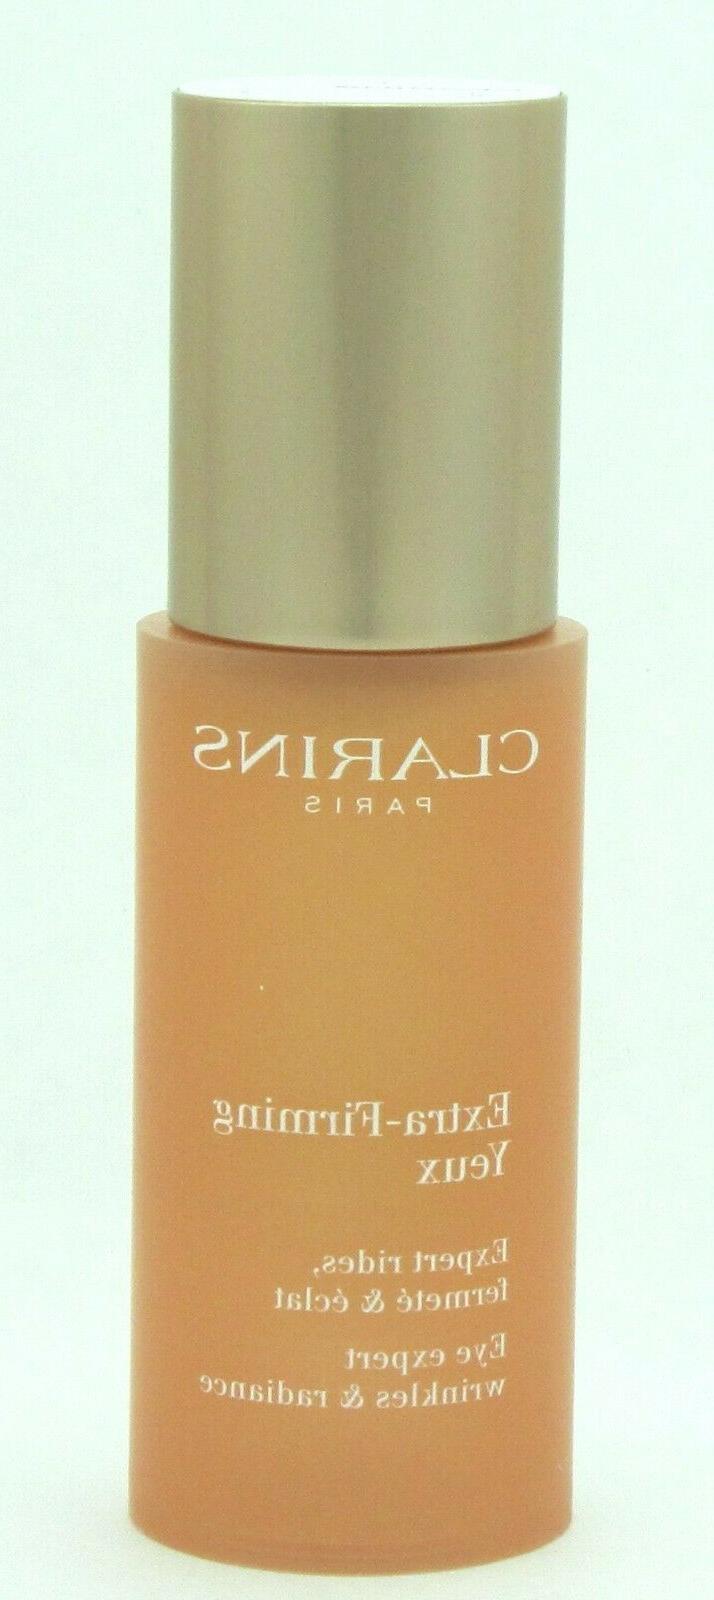 Clarins Expert Wrinkles & Radiance 15 oz Box